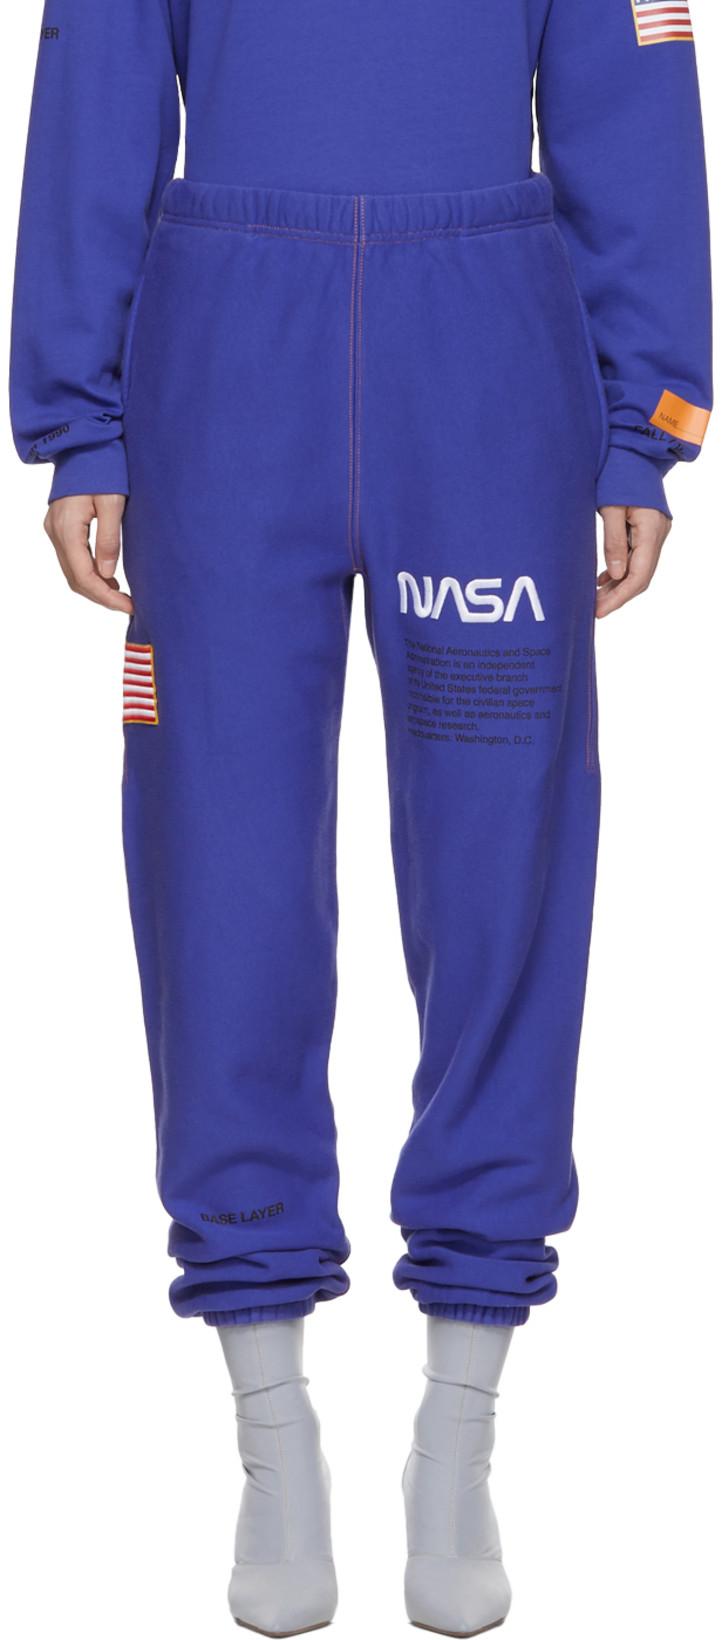 CNK-HP-NASA-11.jpg